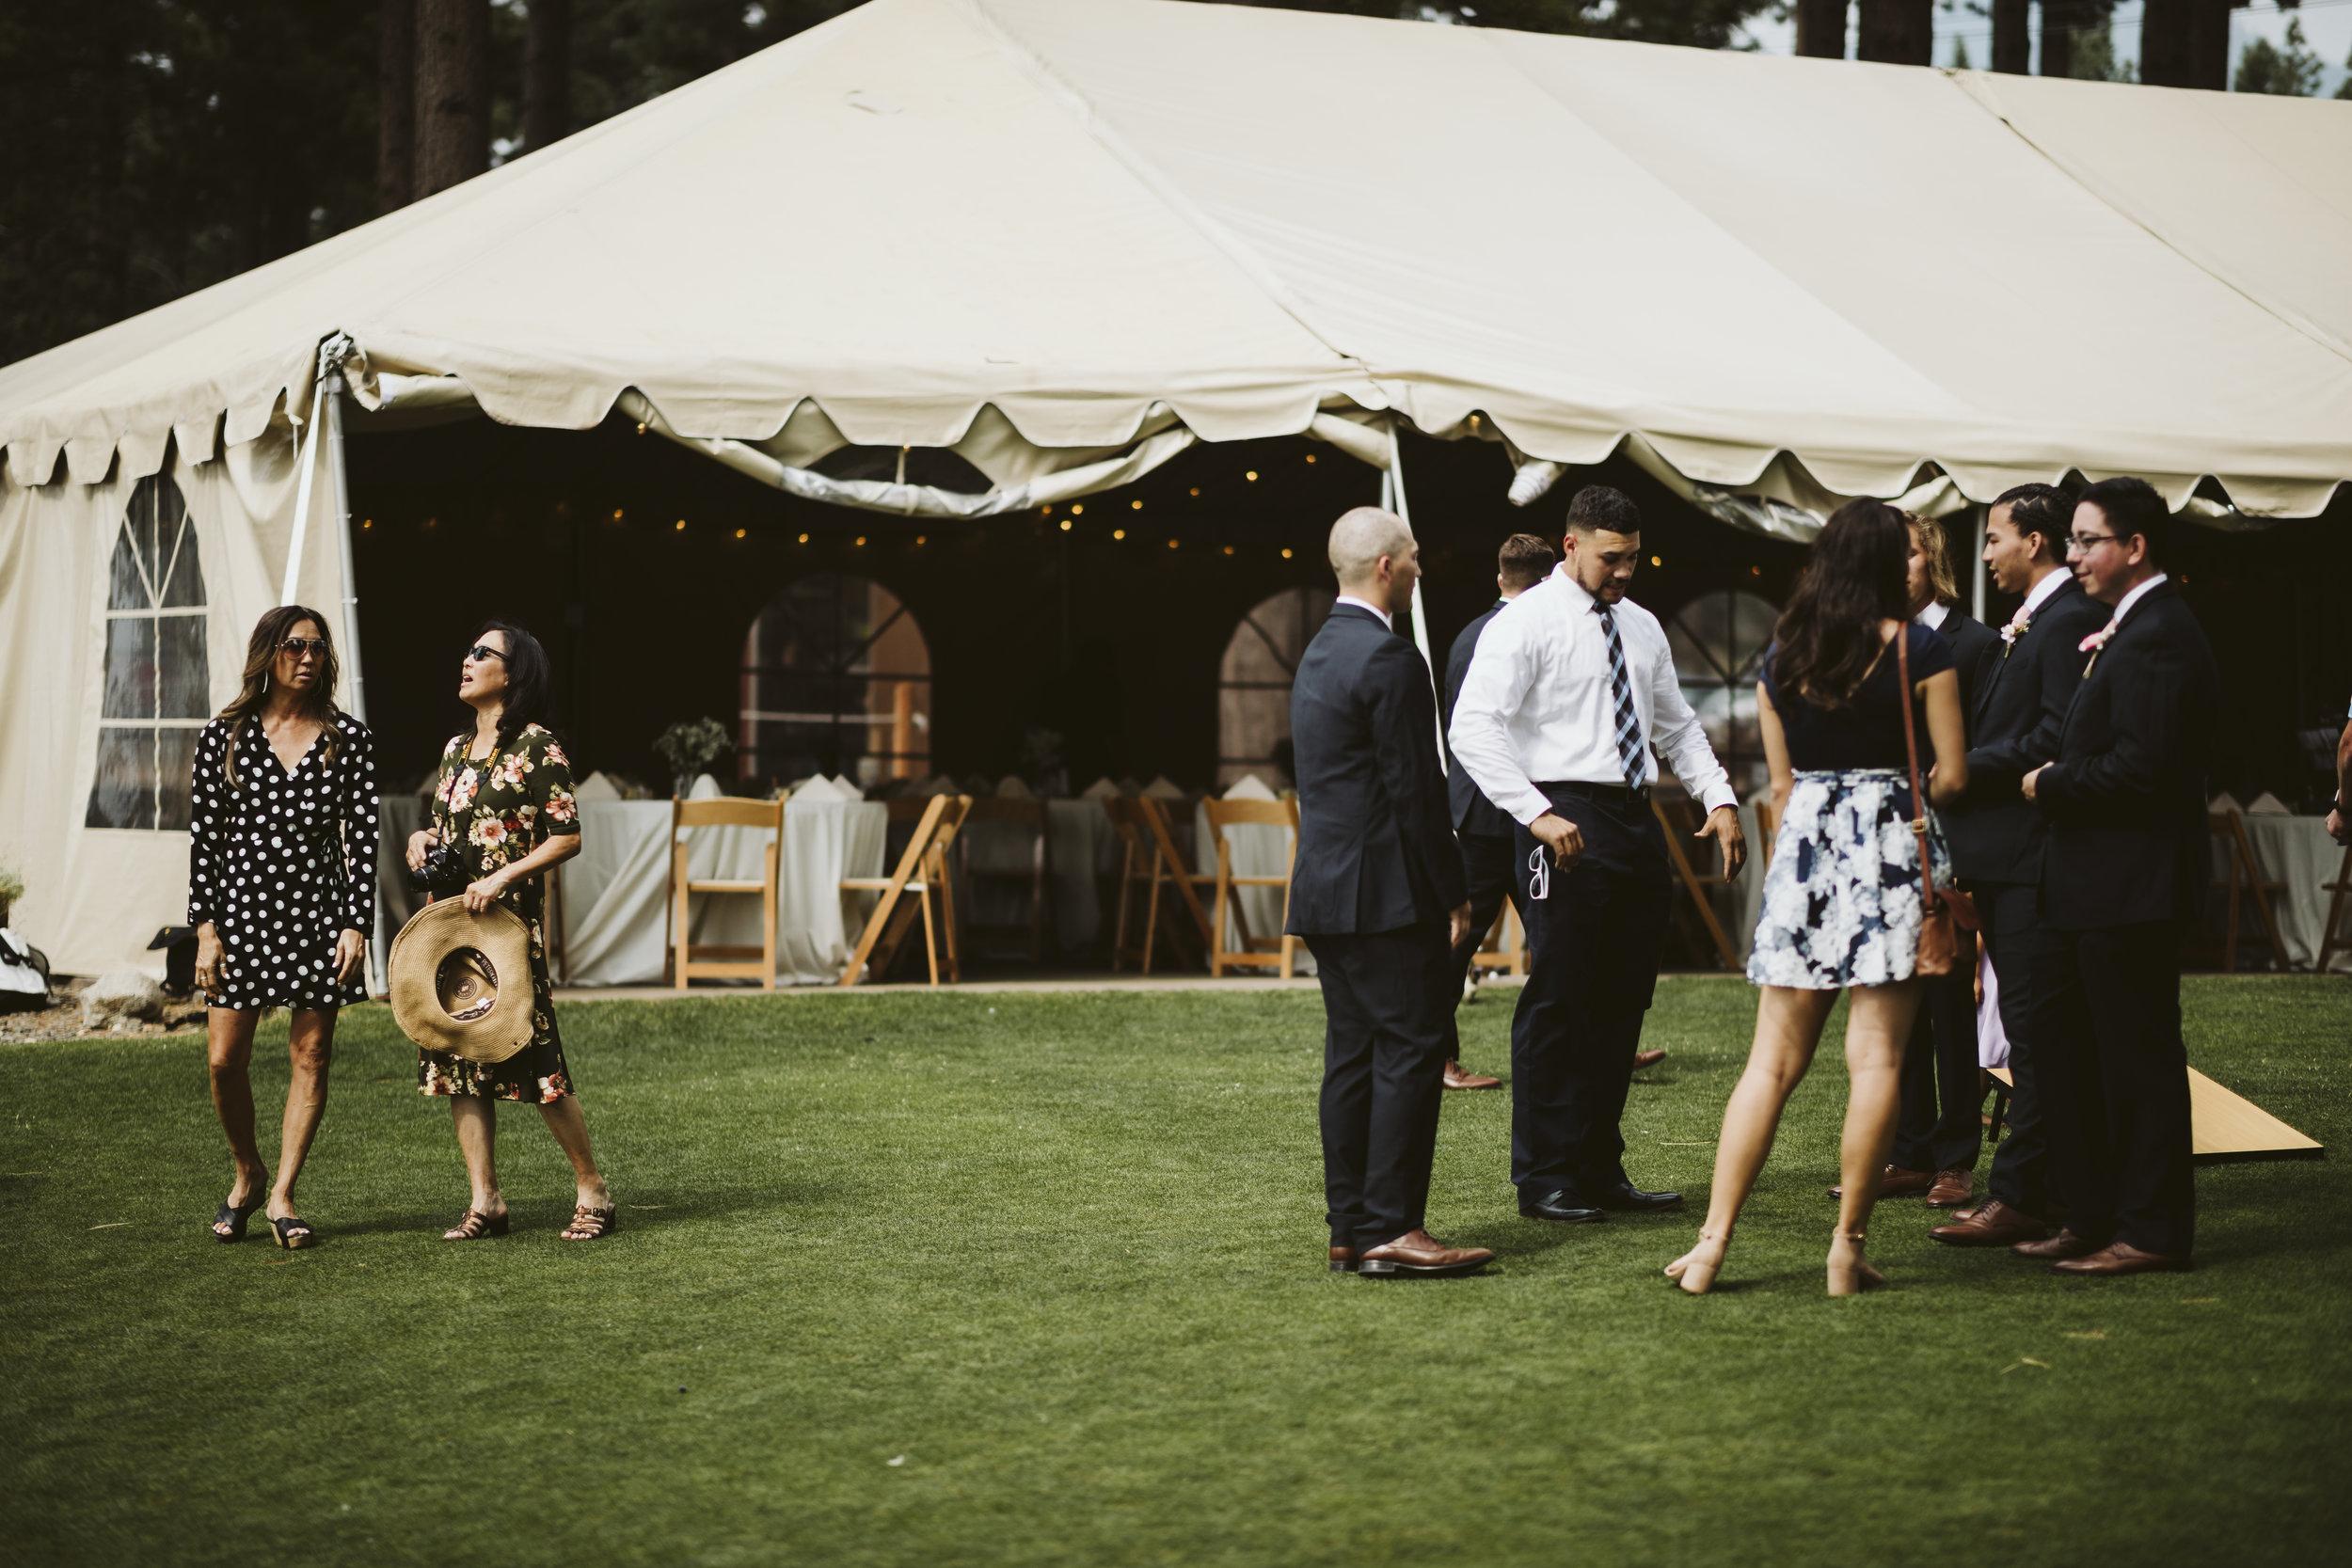 _P8A4079vild-vild photography-photography-wedding-wedding photography-tahoe-lake tahoe-lake tahoe wedding photographer-nevada wedding photographer-mountain wedding.jpg